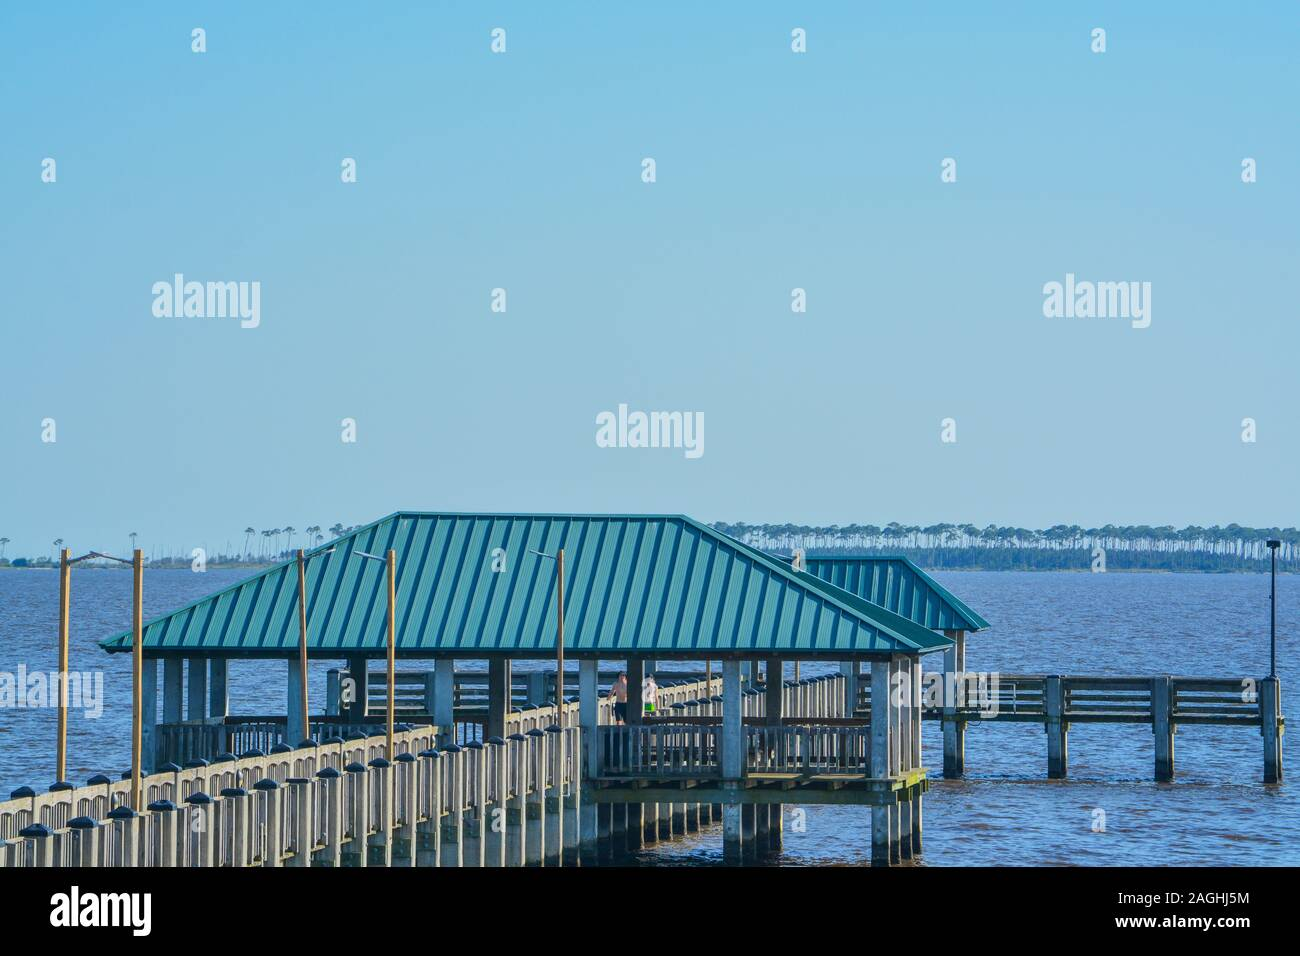 Fishing Pier On The Mississippi Gulf Coast Biloxi Gulf Of Mexico Harrison County Mississippi Usa Stock Photo Alamy